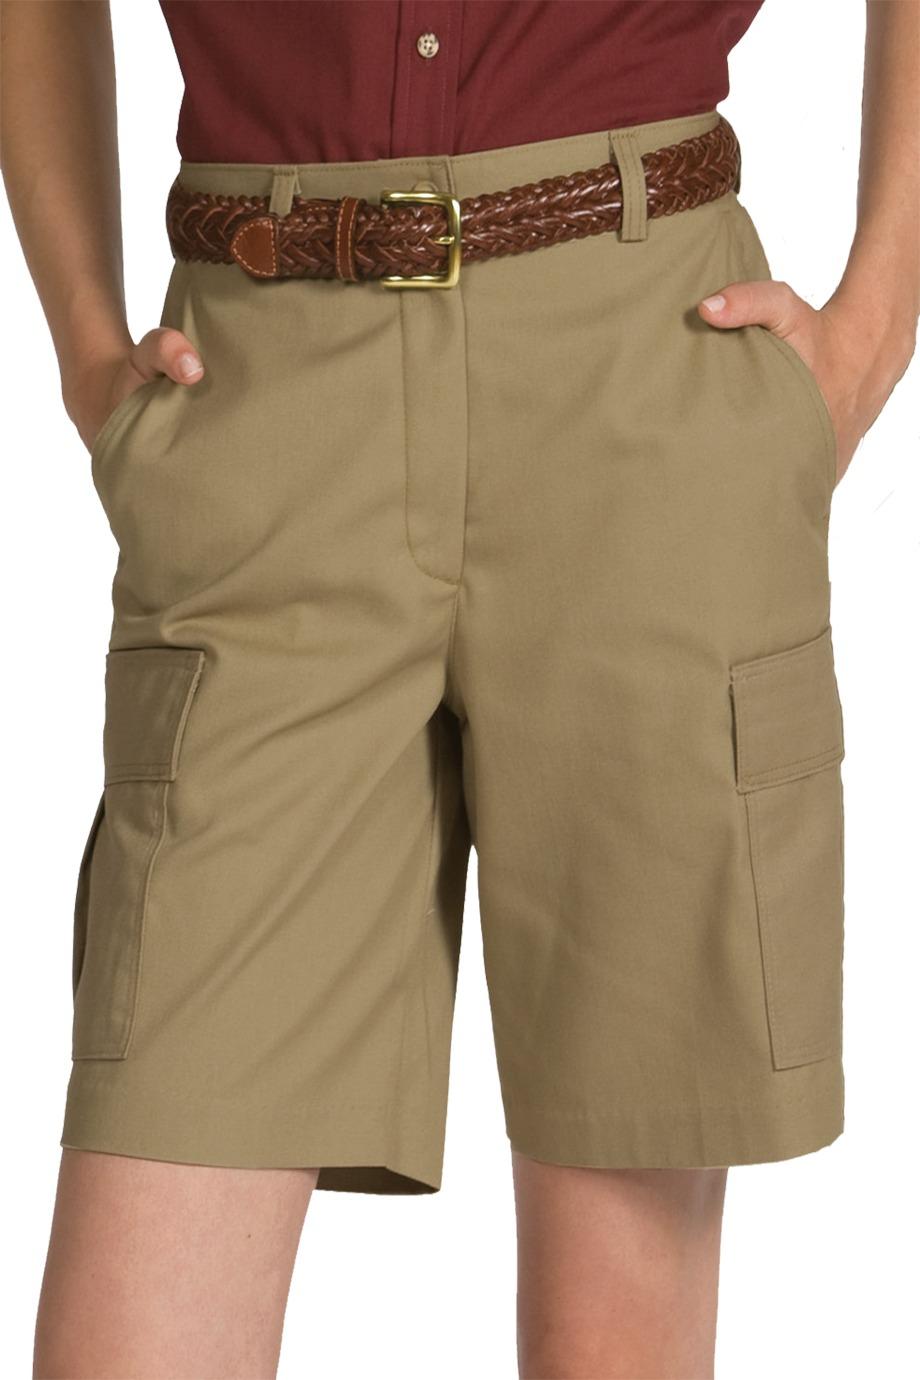 Edwards Garment 8468 - Women's Utility Cargo Short